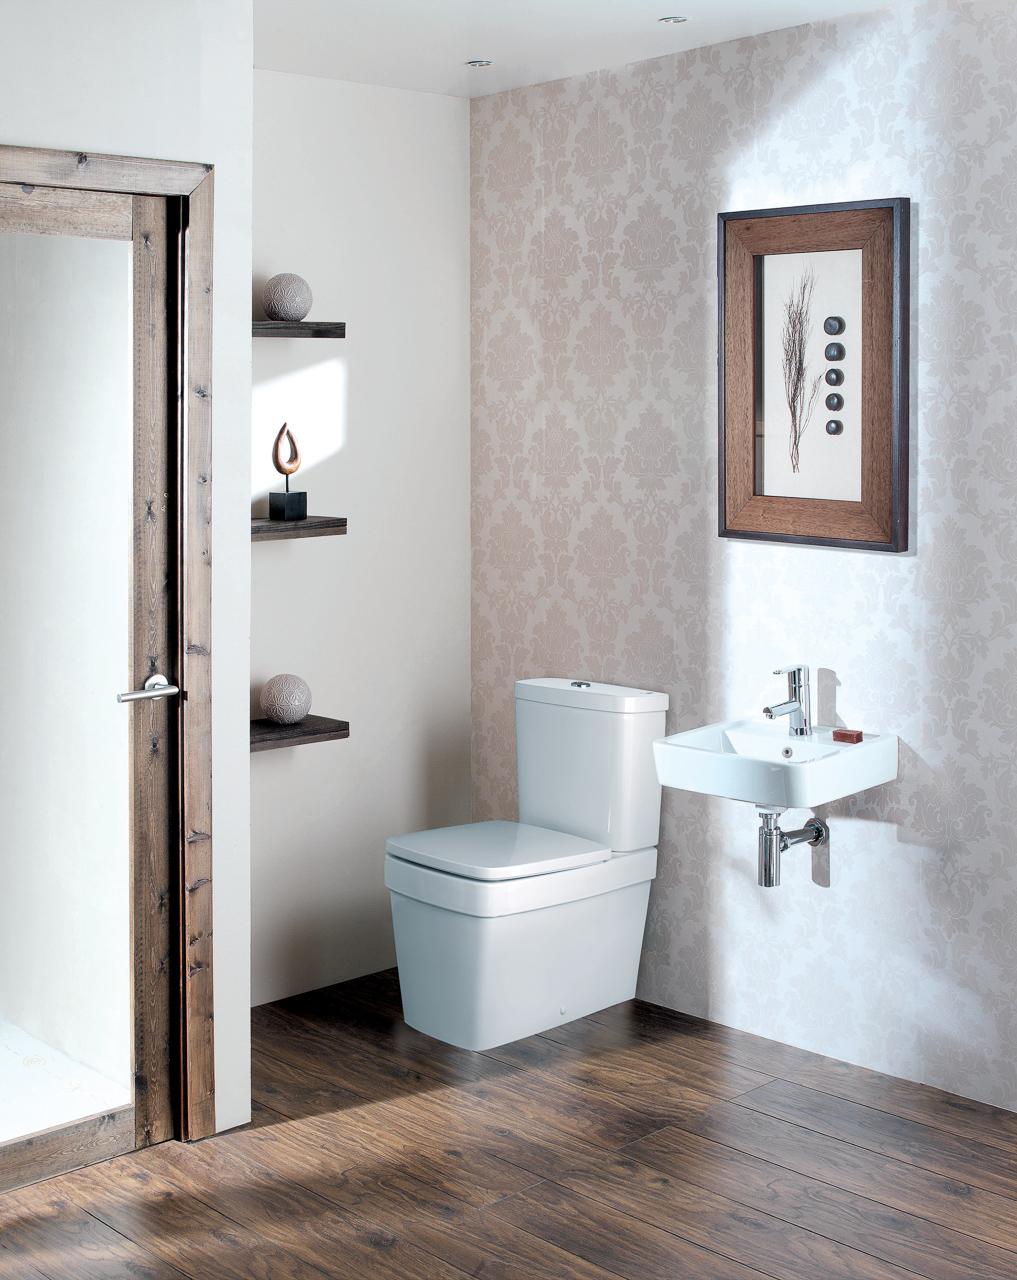 Silverdale Bathrooms: Henley Pan